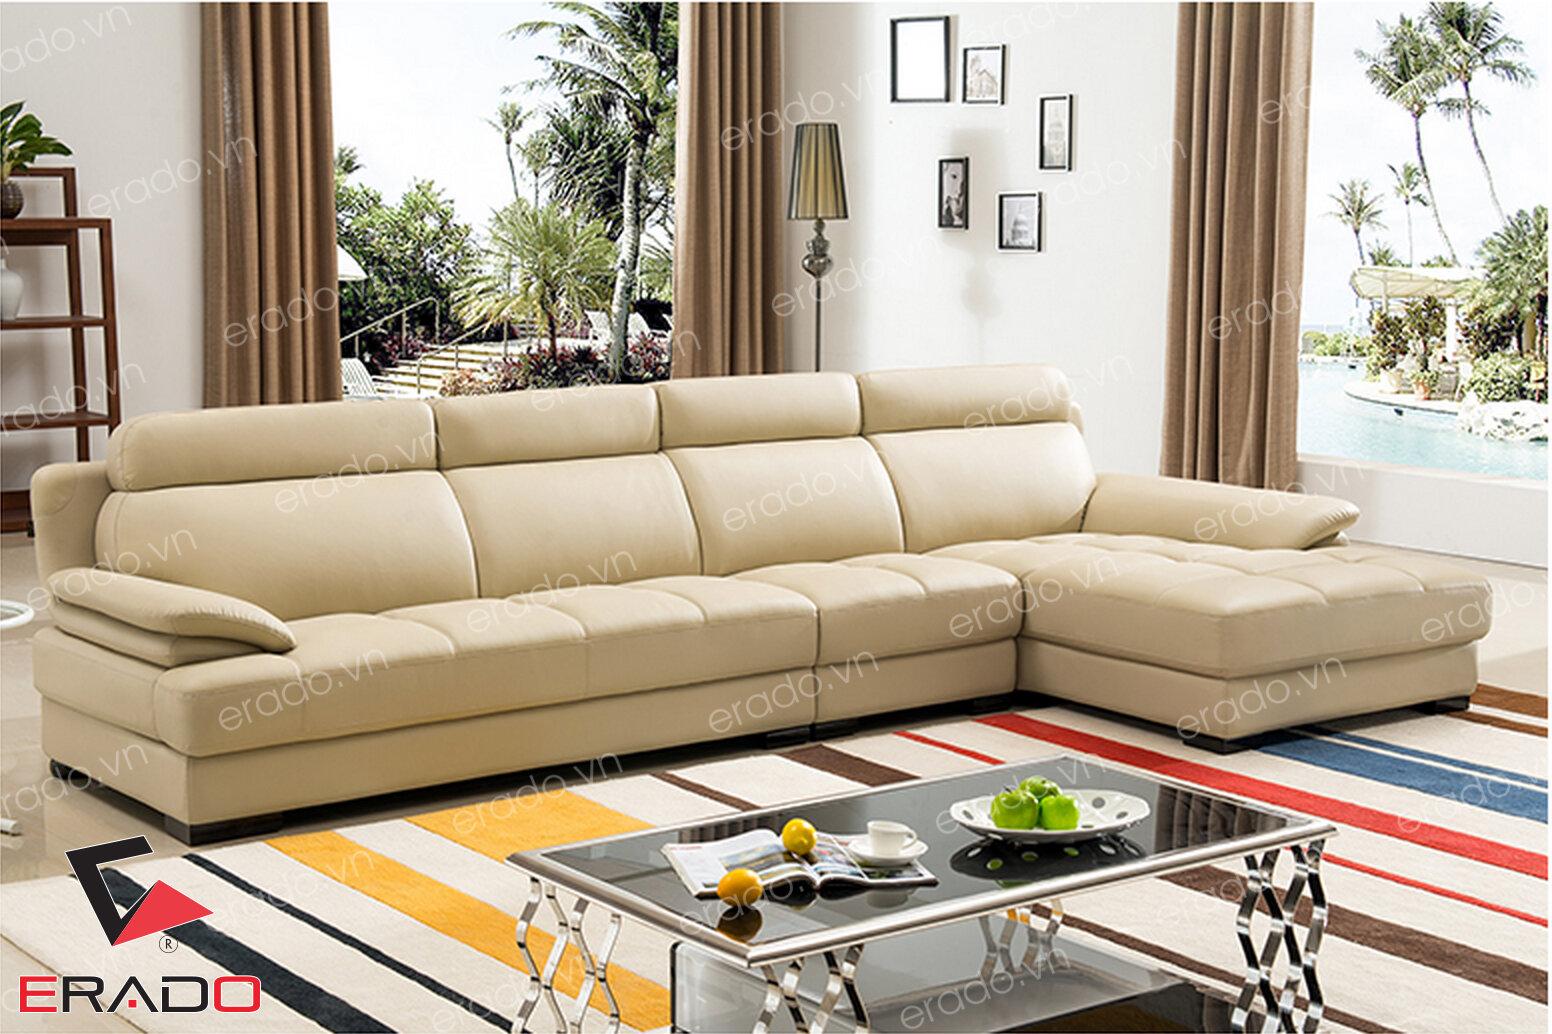 Sofa da mã 229